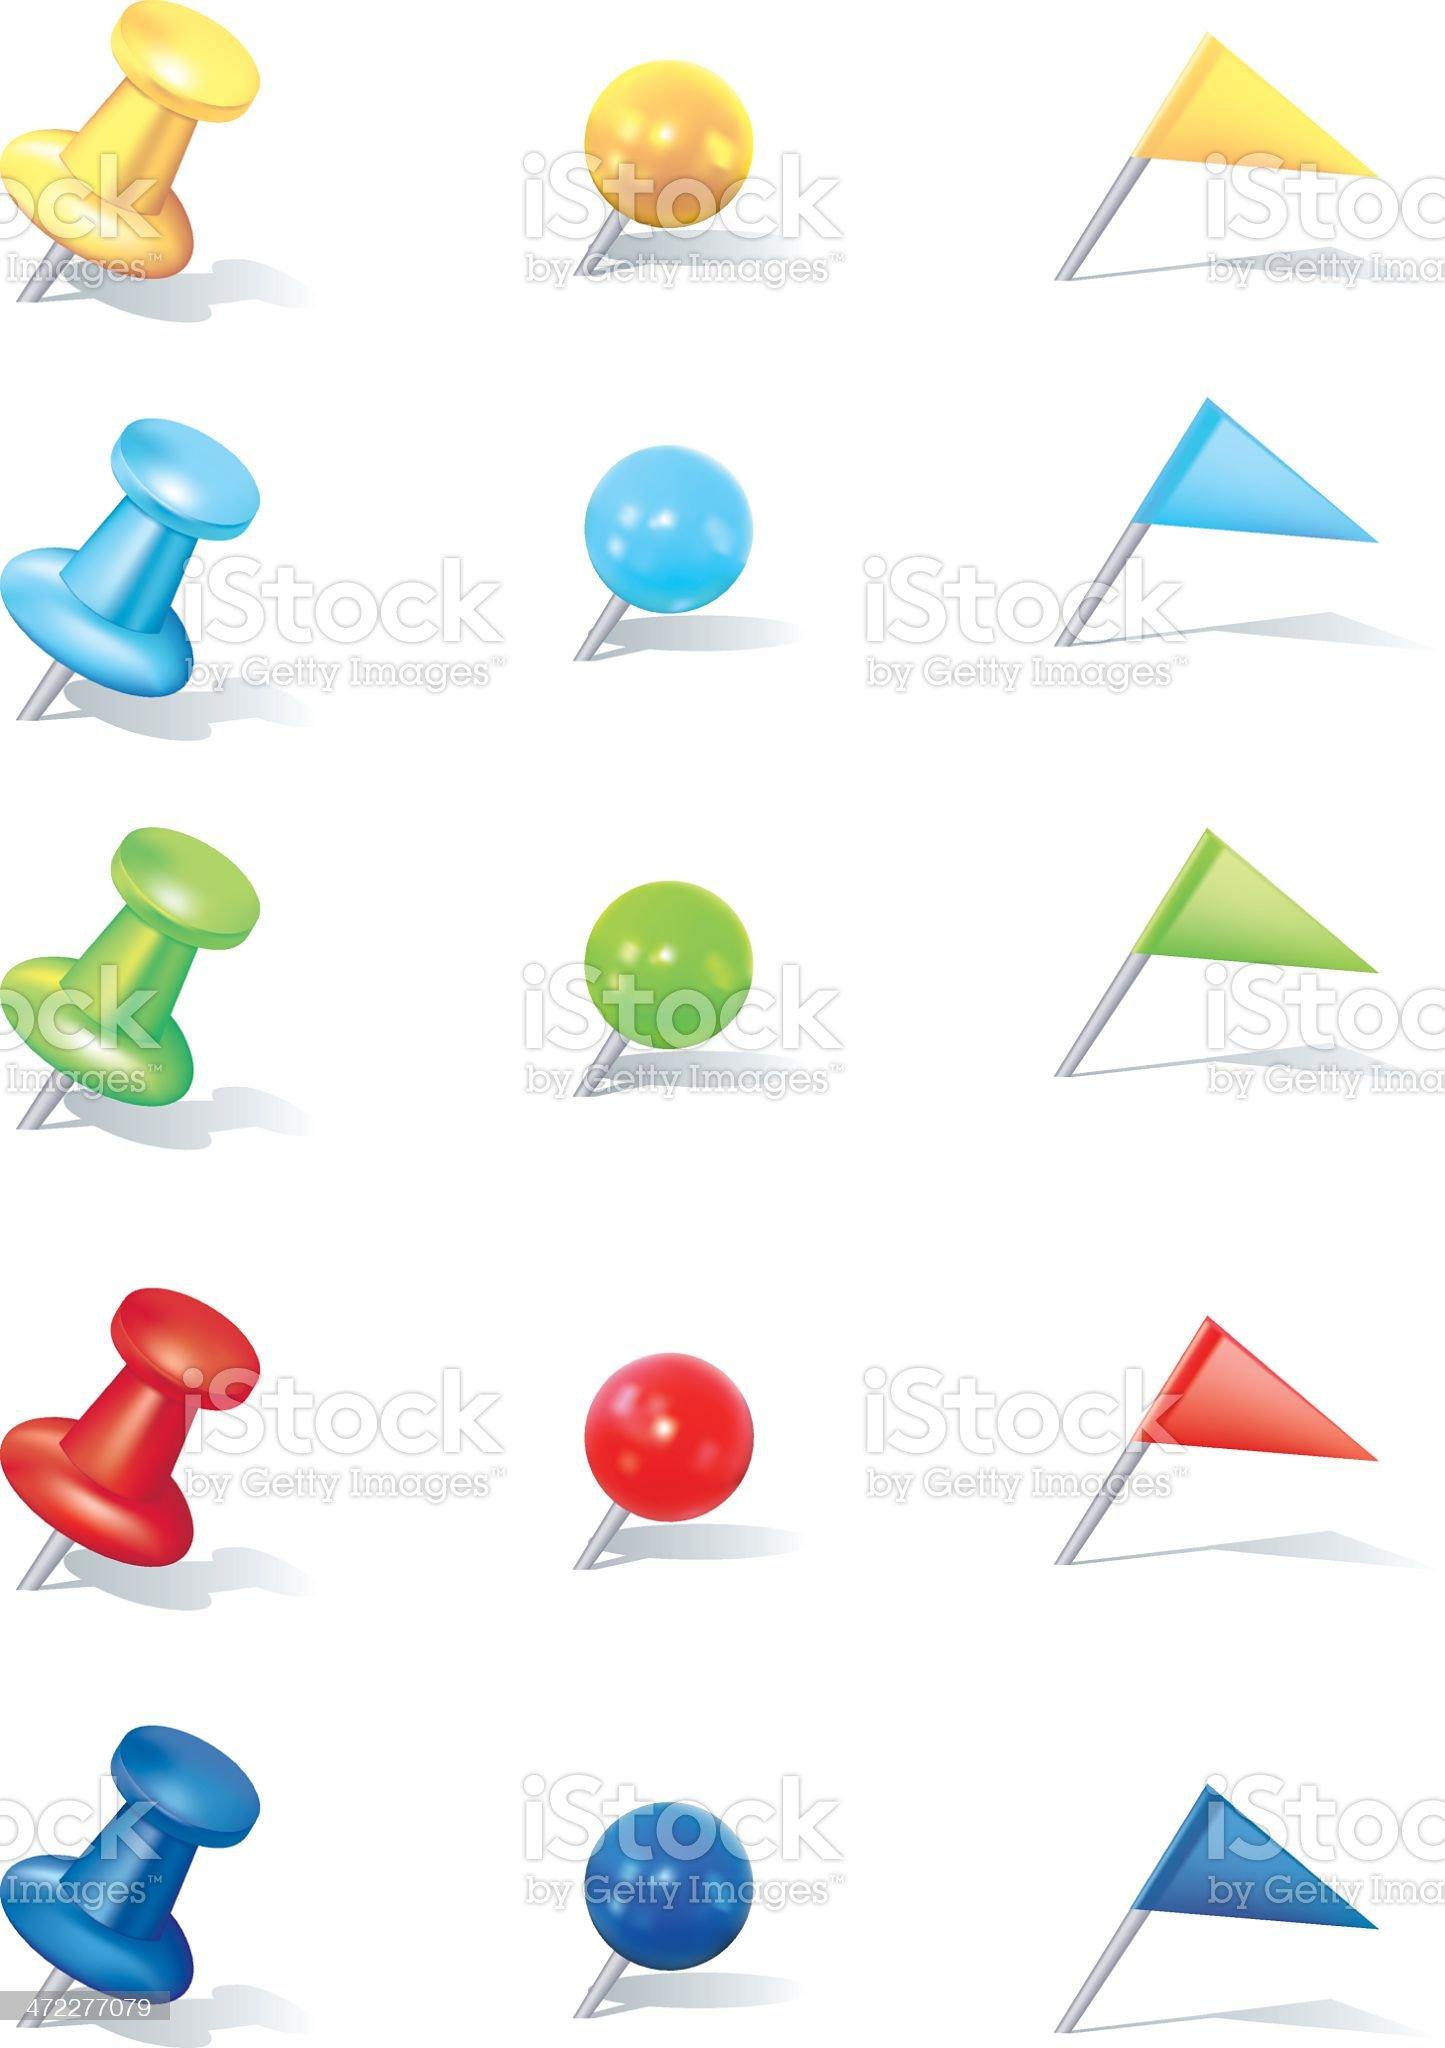 Thumbtack Set. royalty-free stock vector art